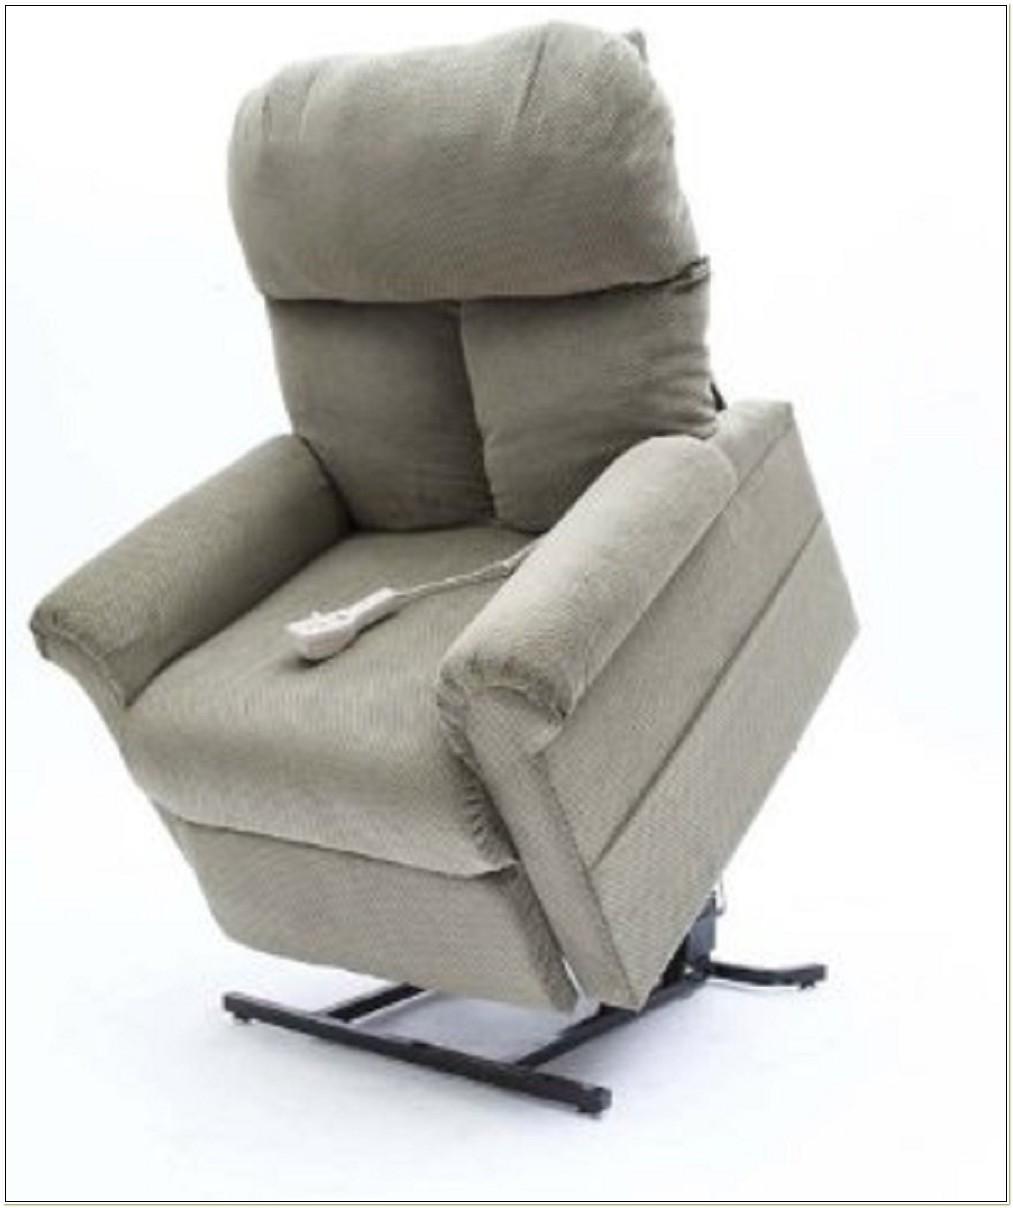 Walgreens Full Recline Lift Chair